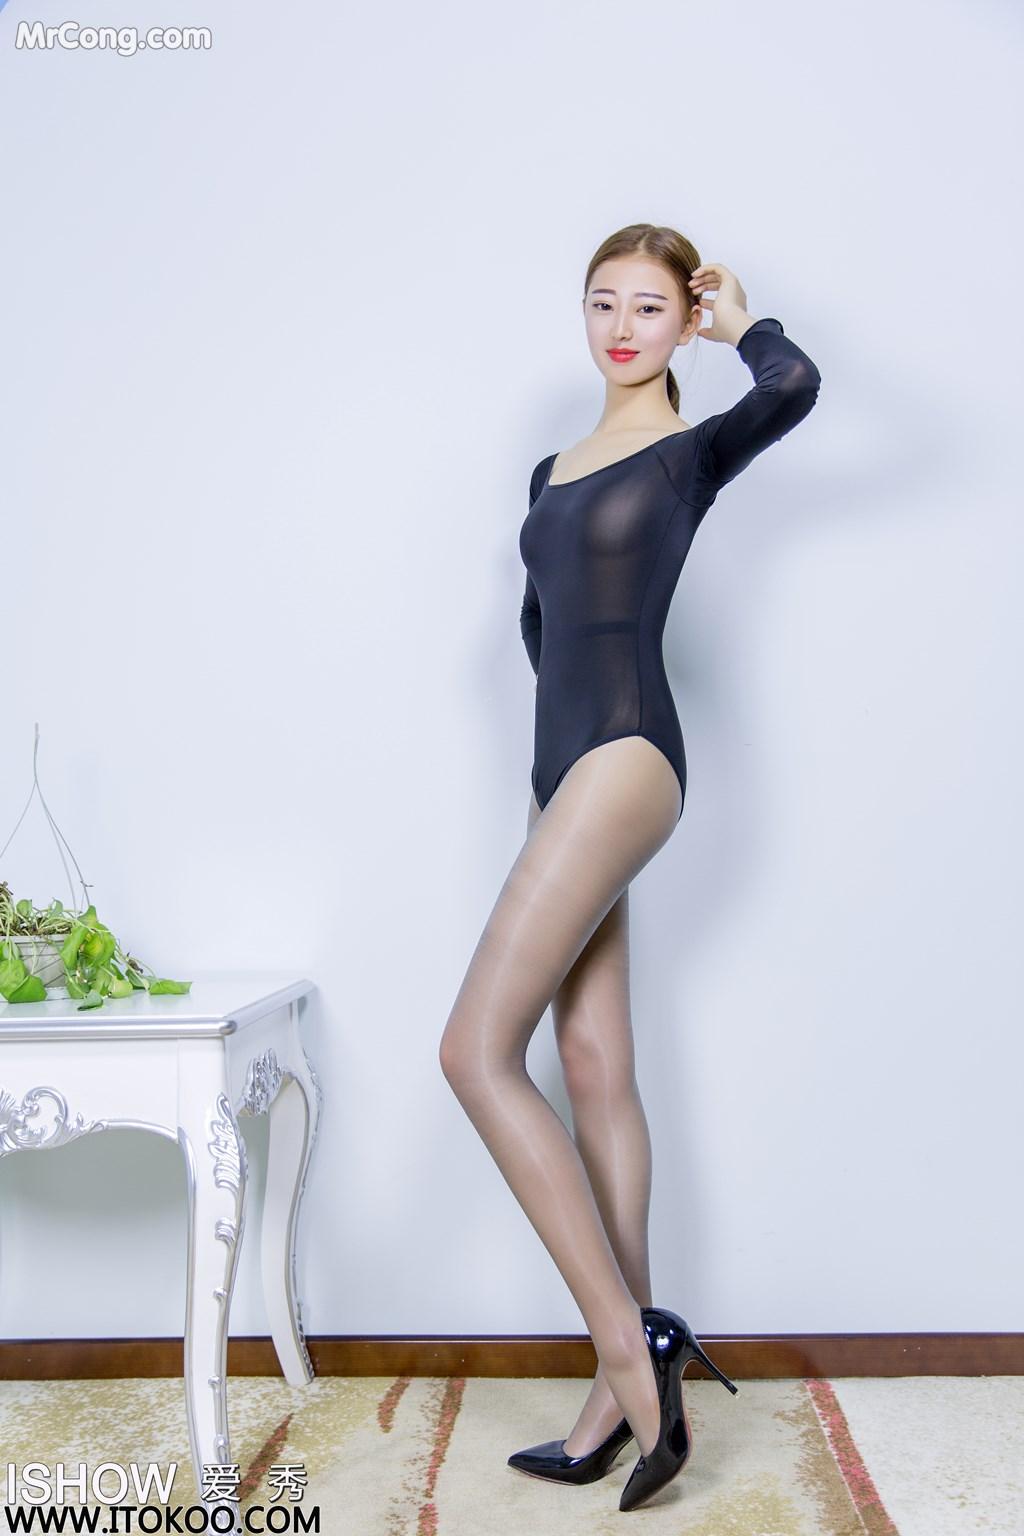 Image ISHOW-No.151-Han-Zhi-Ying-Flora-MrCong.com-003 in post ISHOW No.151: Người mẫu Han Zhi Ying (寒栀樱Flora) (31 ảnh)